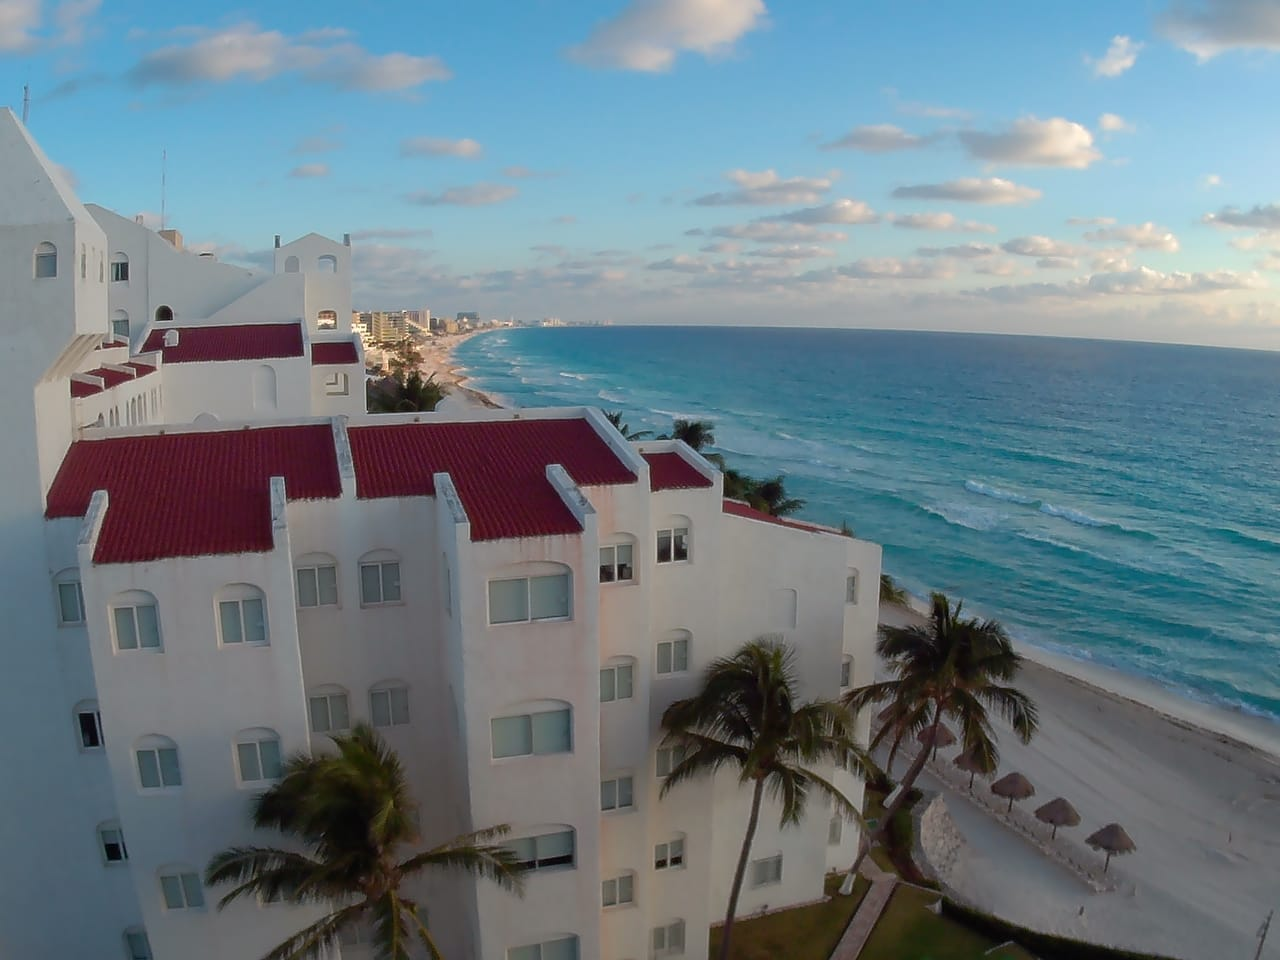 Zona Hotelera, Cancún